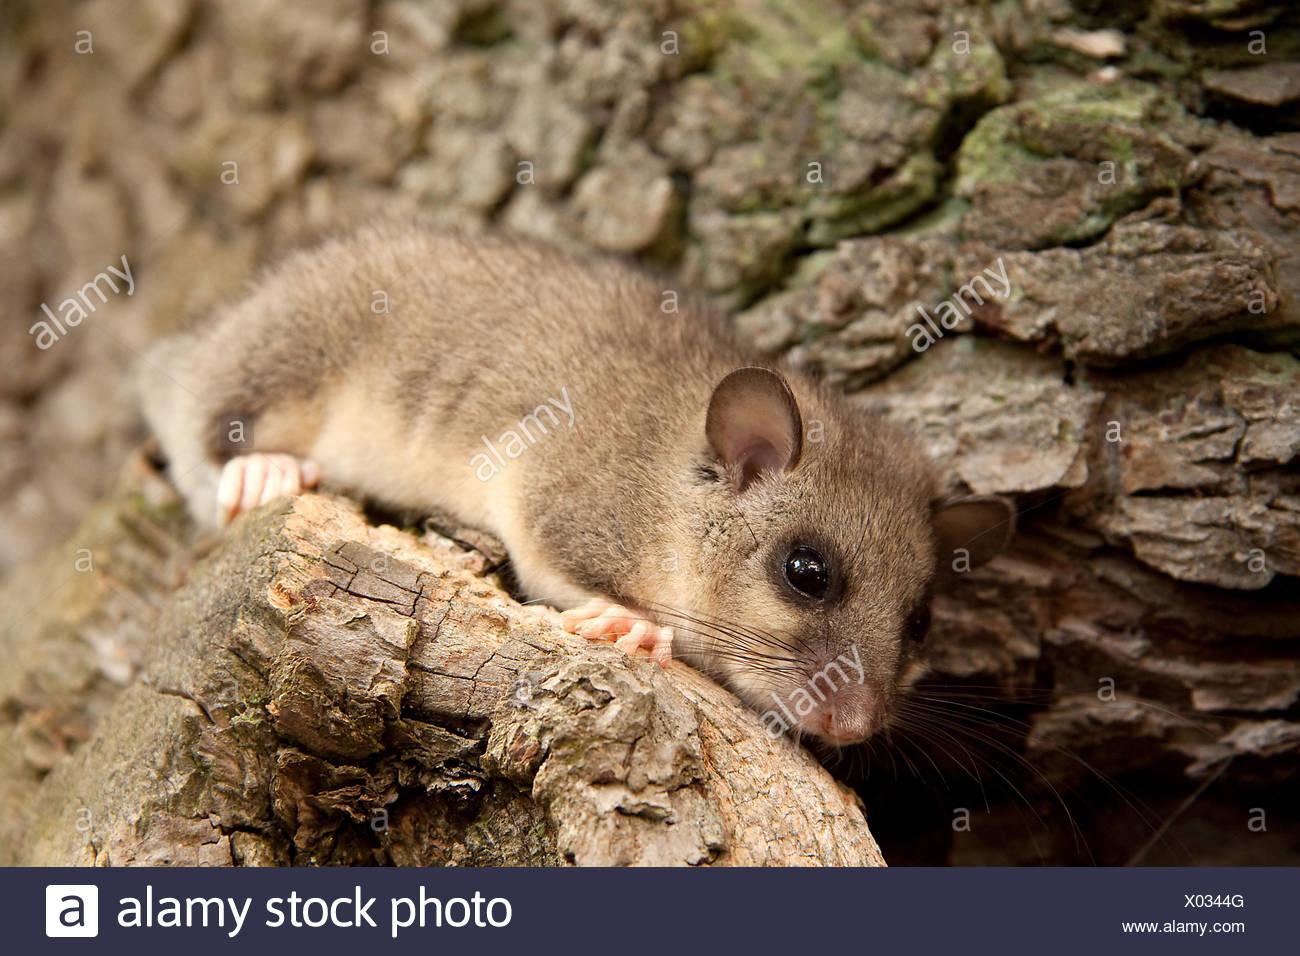 tree animals cub - Stock Image